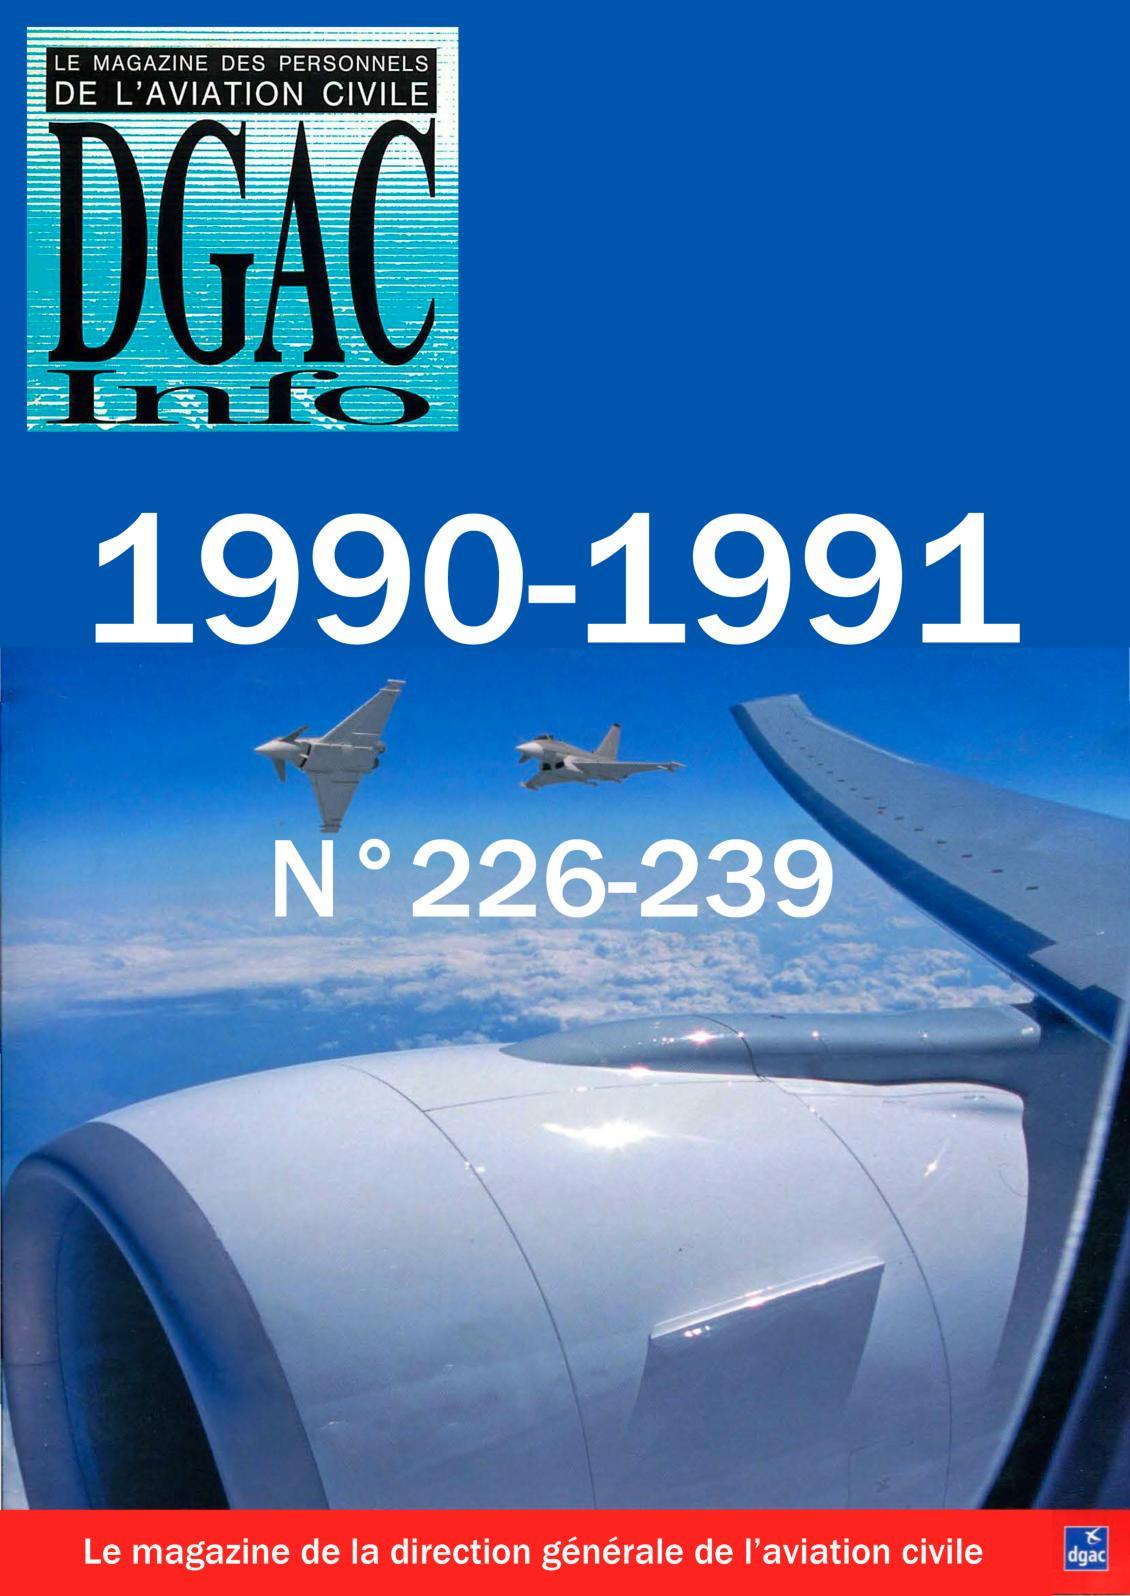 c7d0eef5f Calaméo - 1990 1991 Aviation Civile 226 239